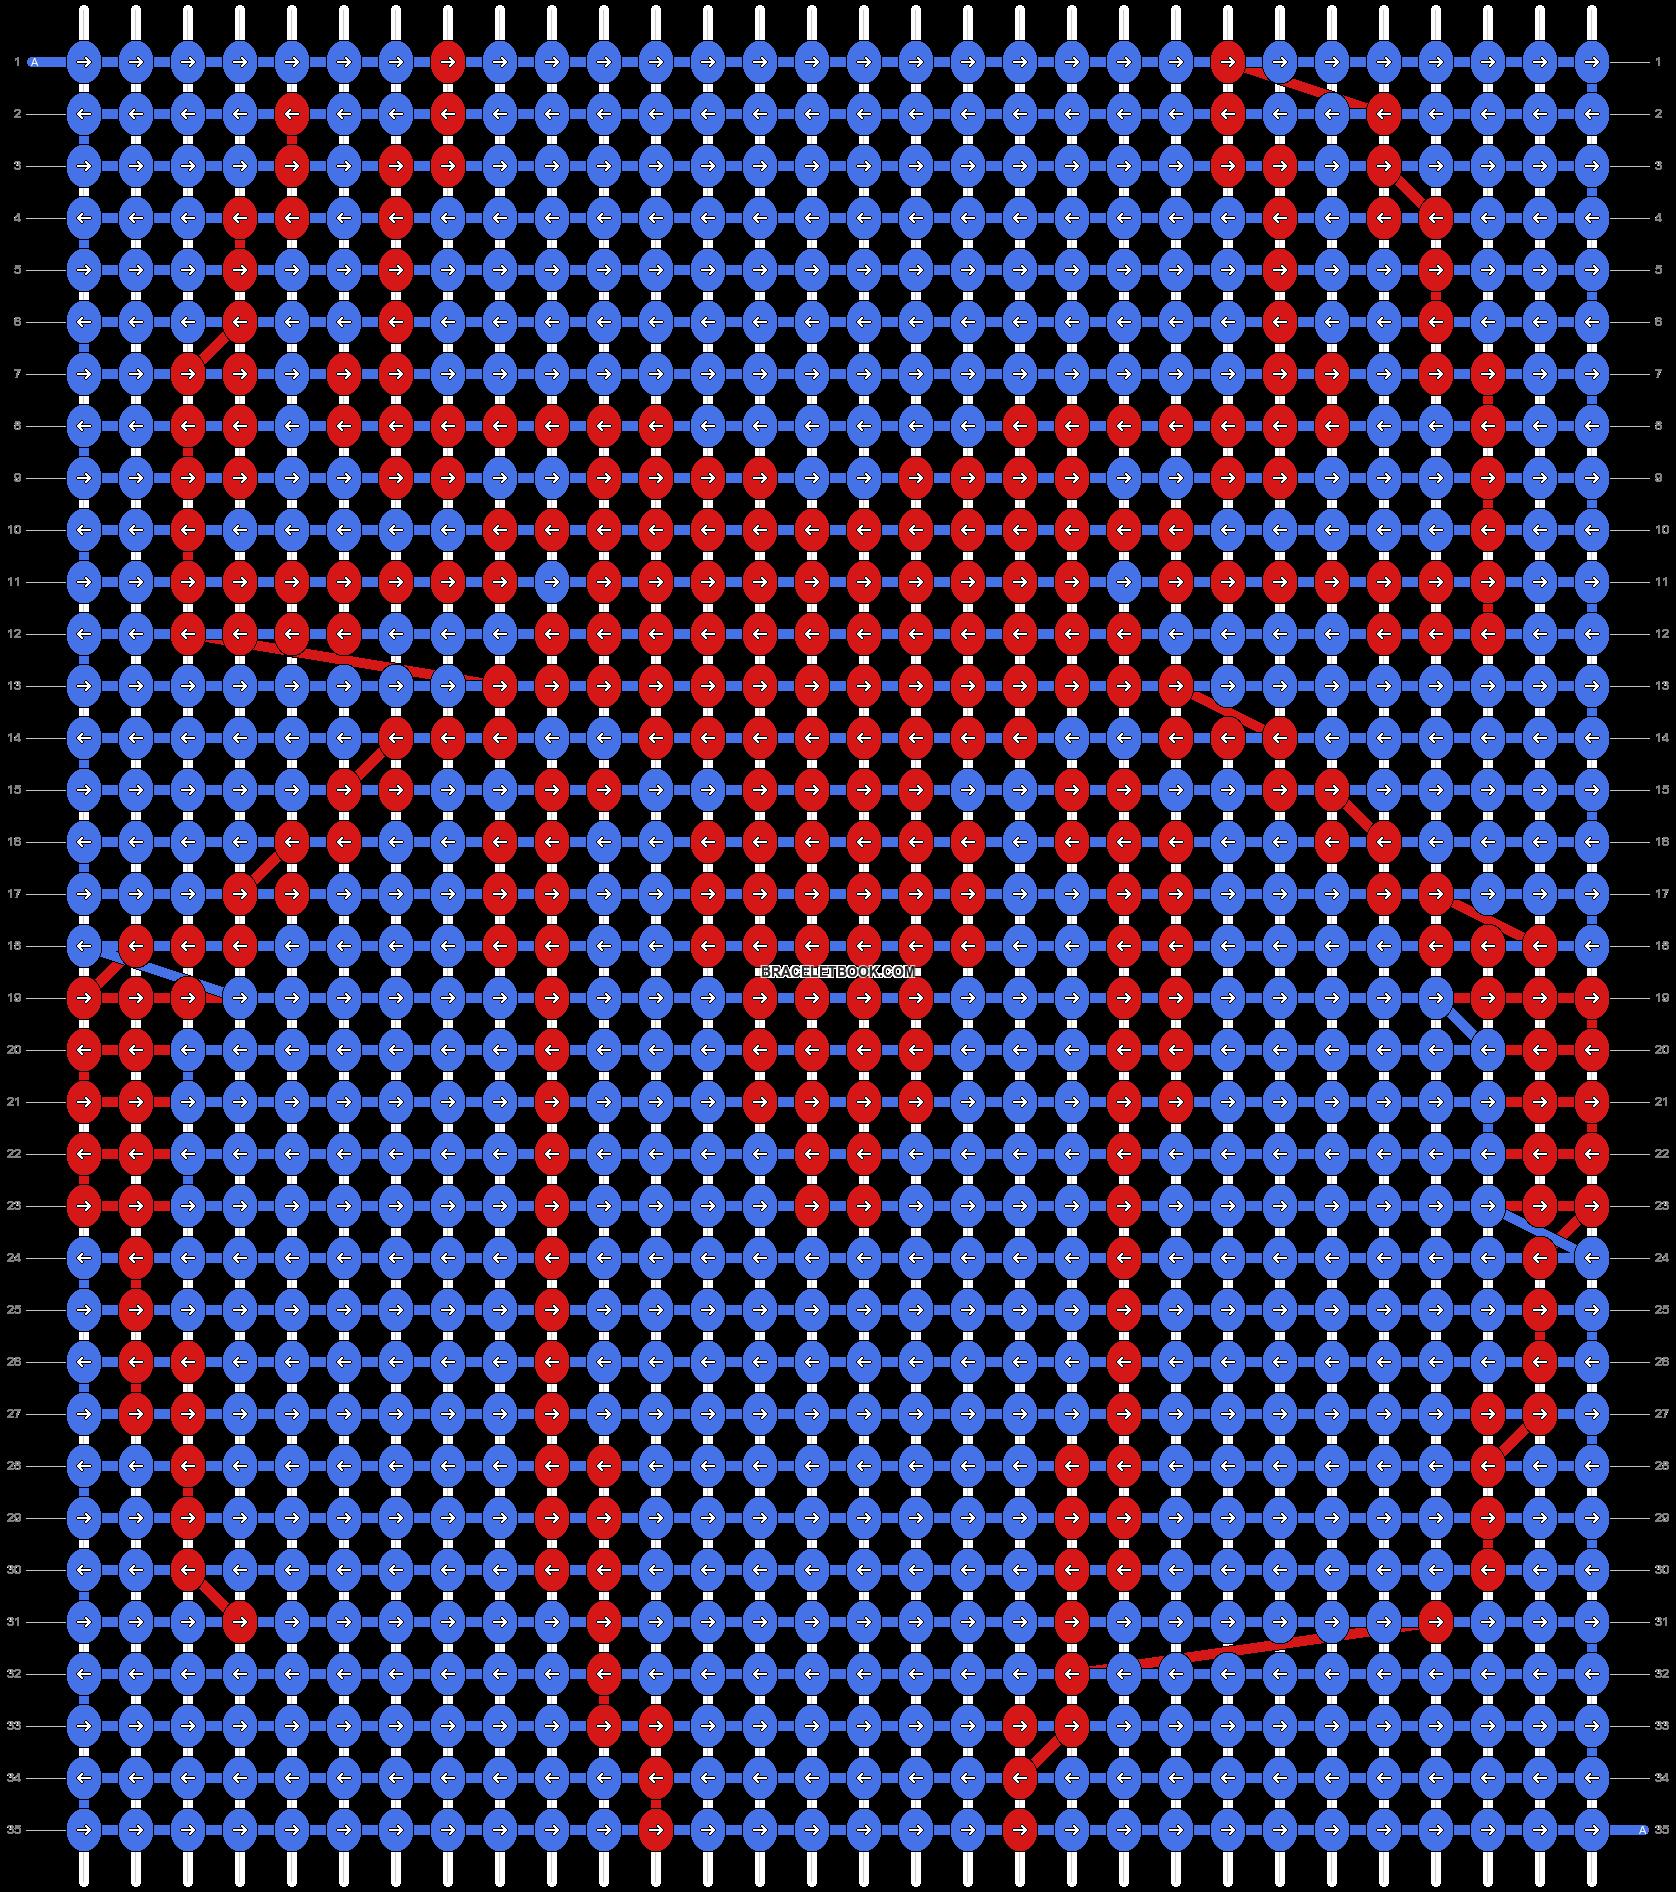 Alpha Pattern #22512 added by Avenger_